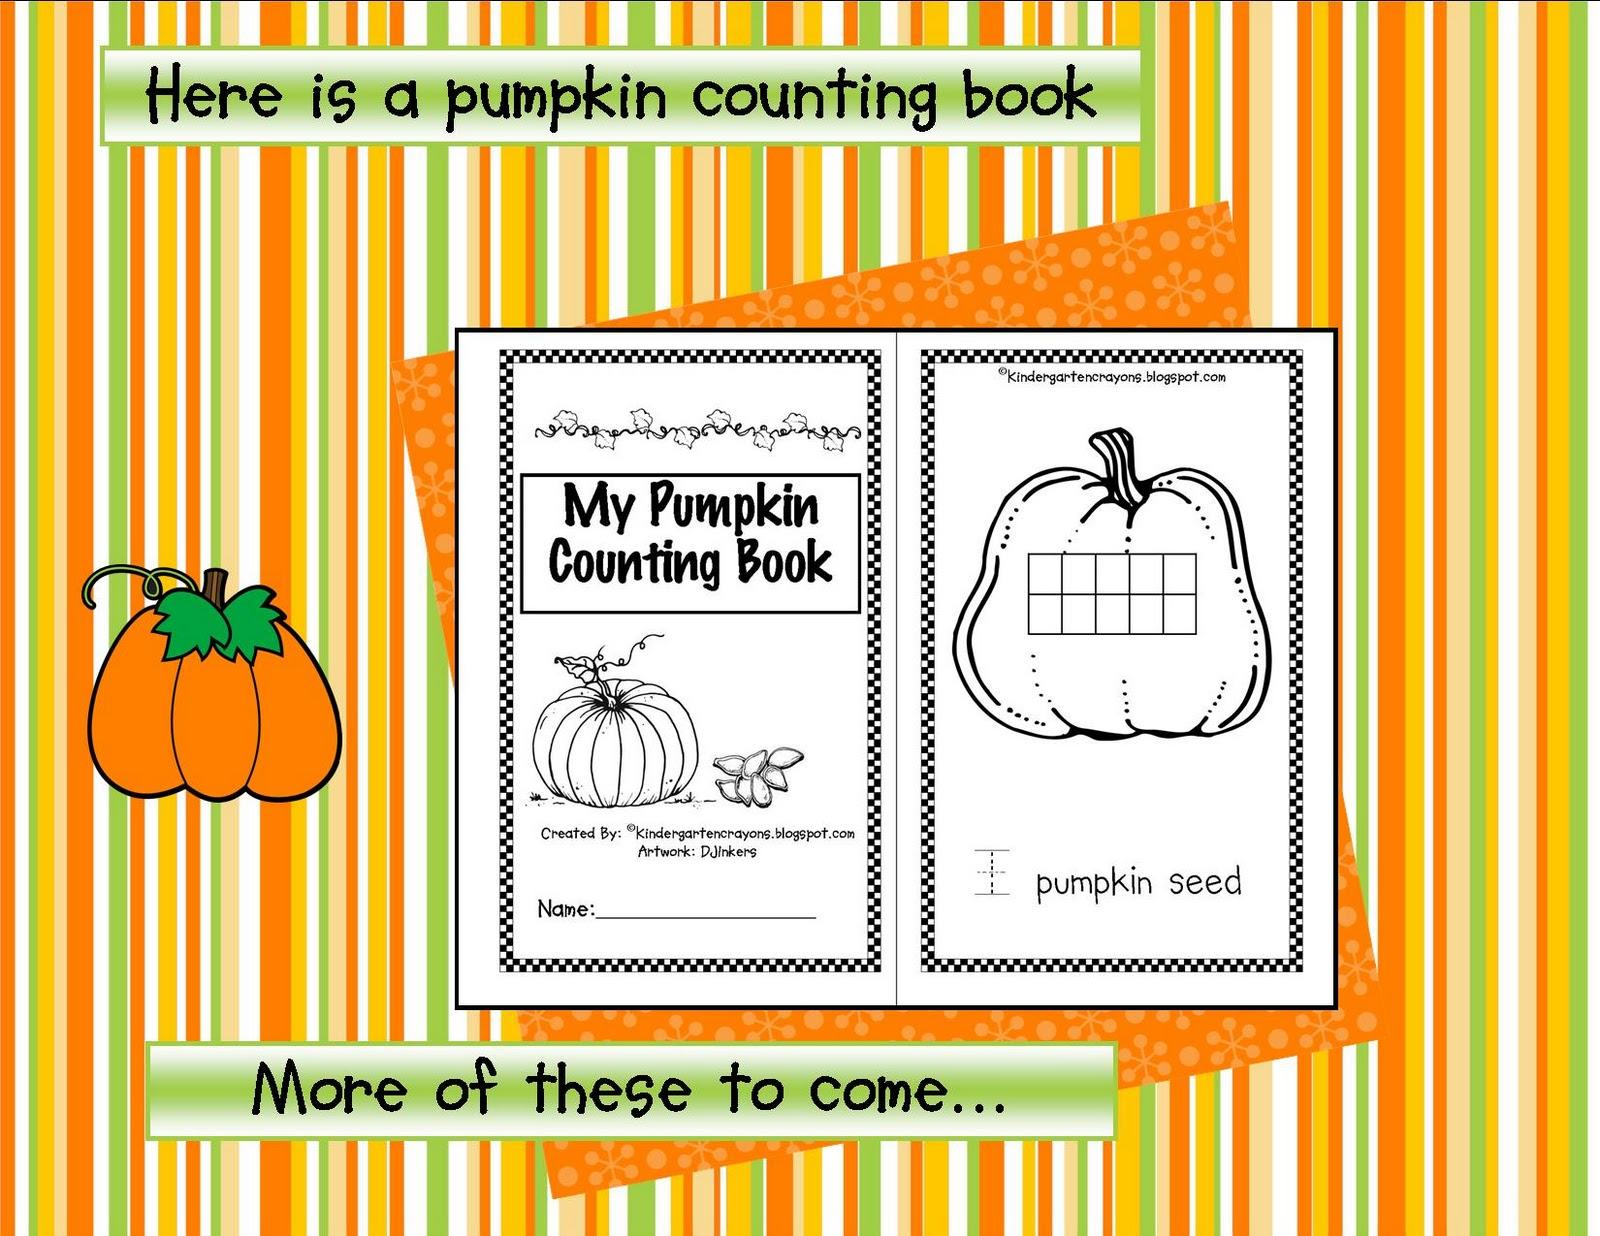 Kindergarten Crayons Pumpkin Seeds Count Them And Eat Them